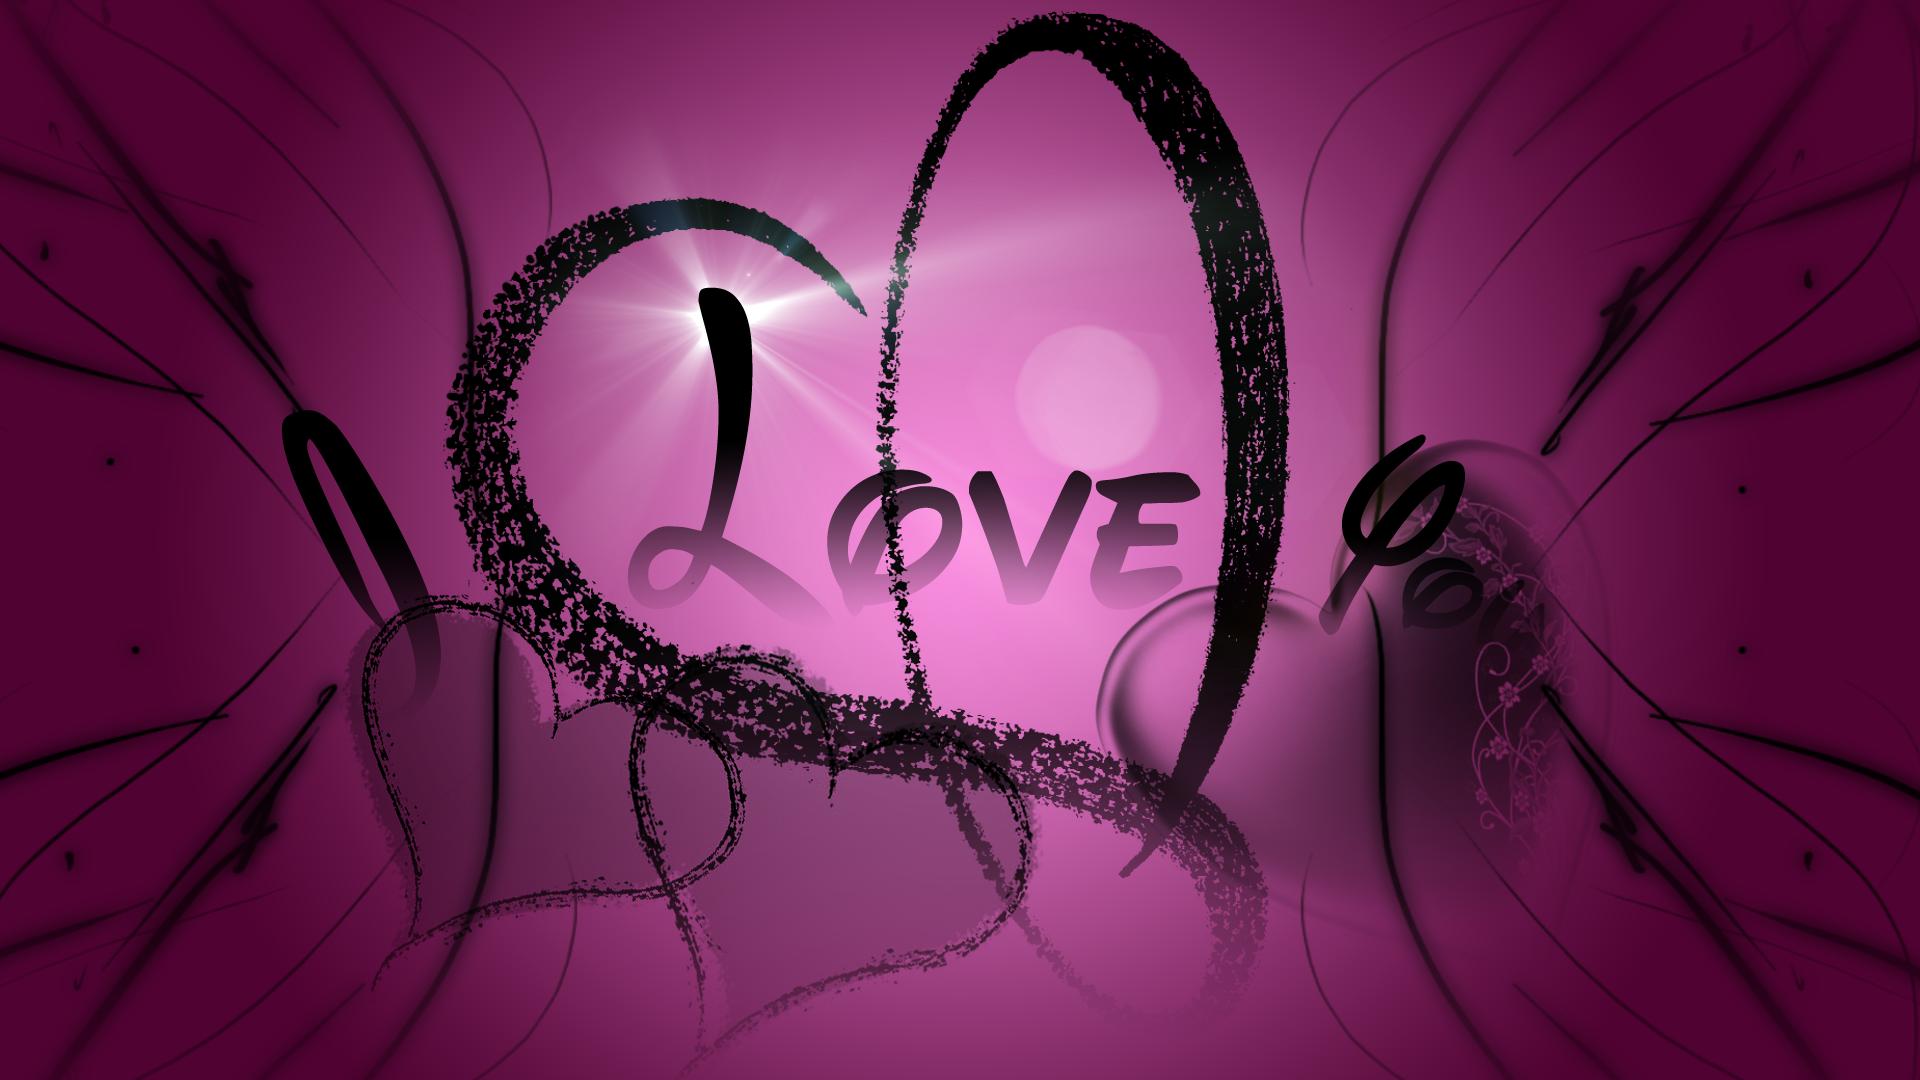 Hd wallpaper upload - Heart Full Hd Wallpaper